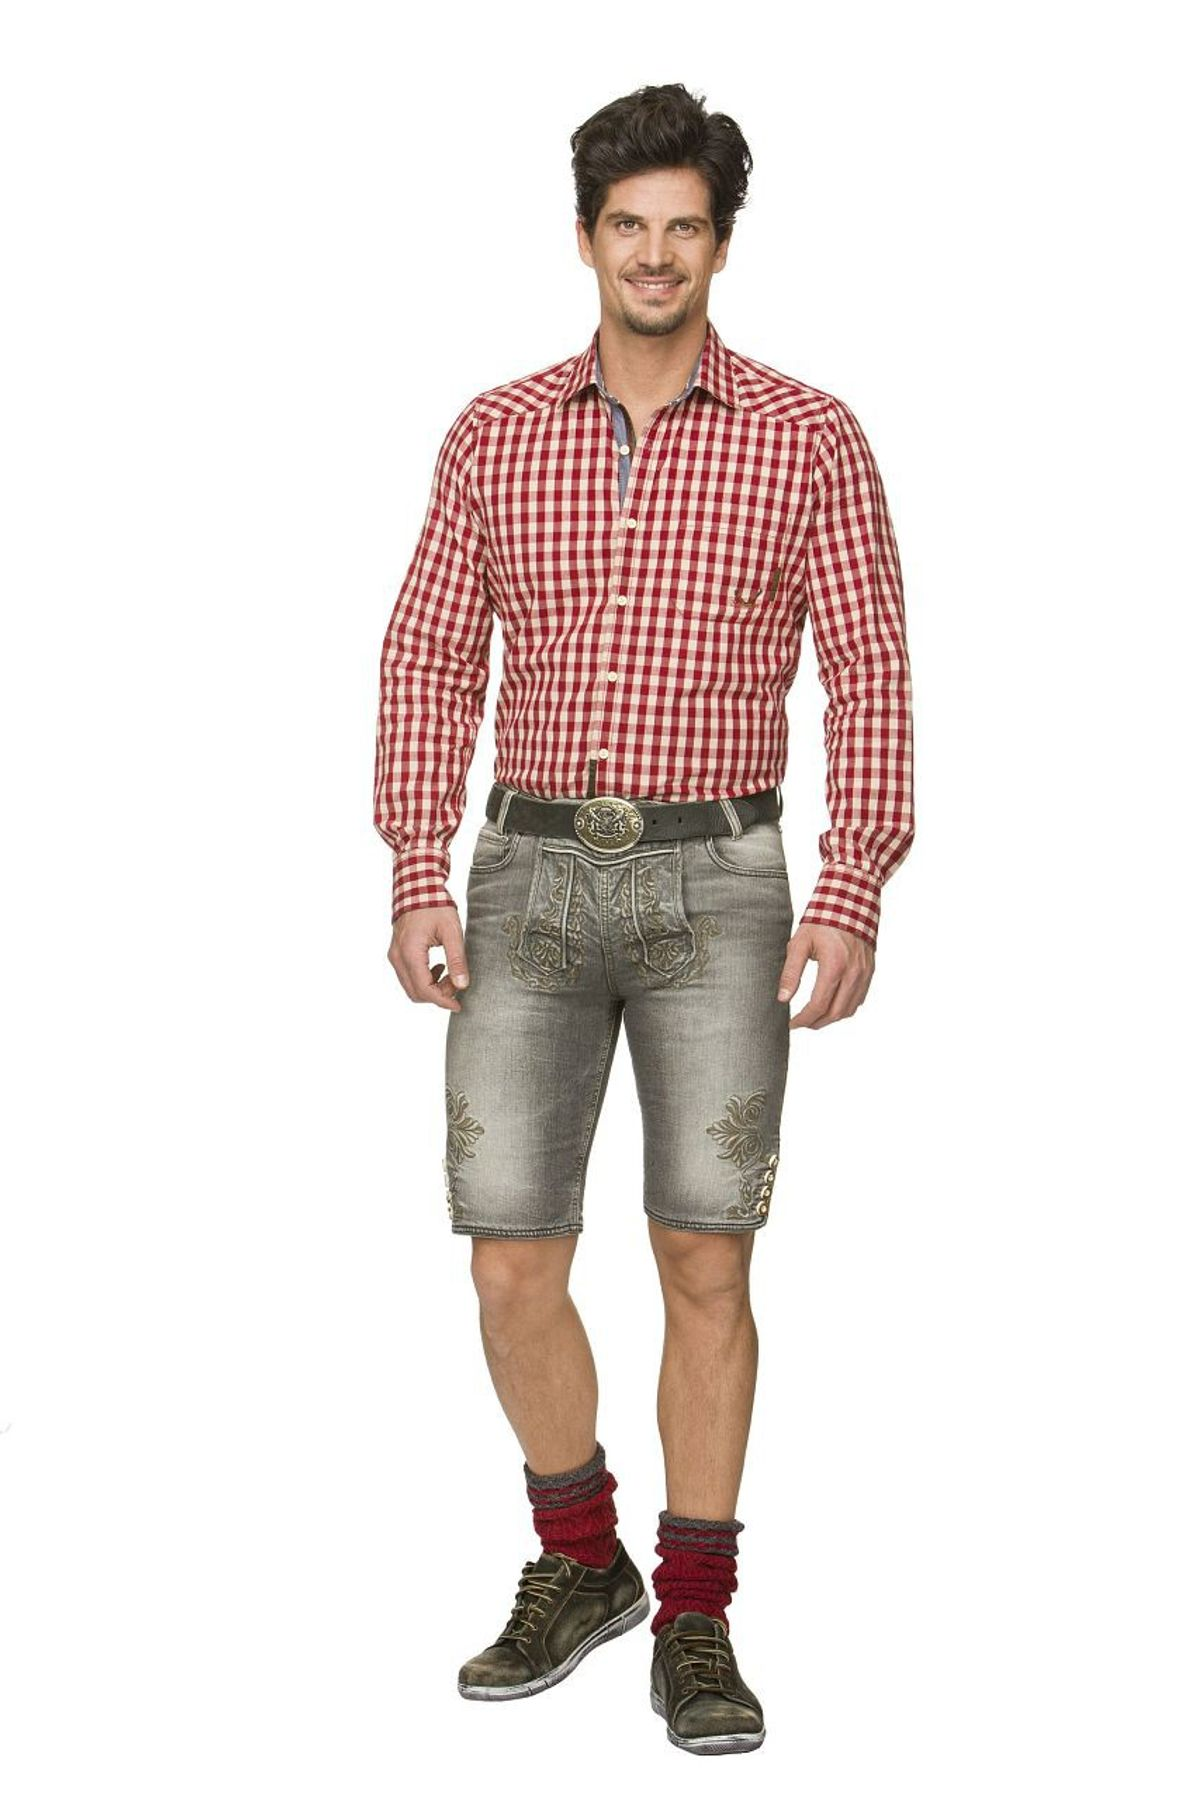 Stockerpoint - Herren Trachtenshort Jeans, Mick – Bild 7